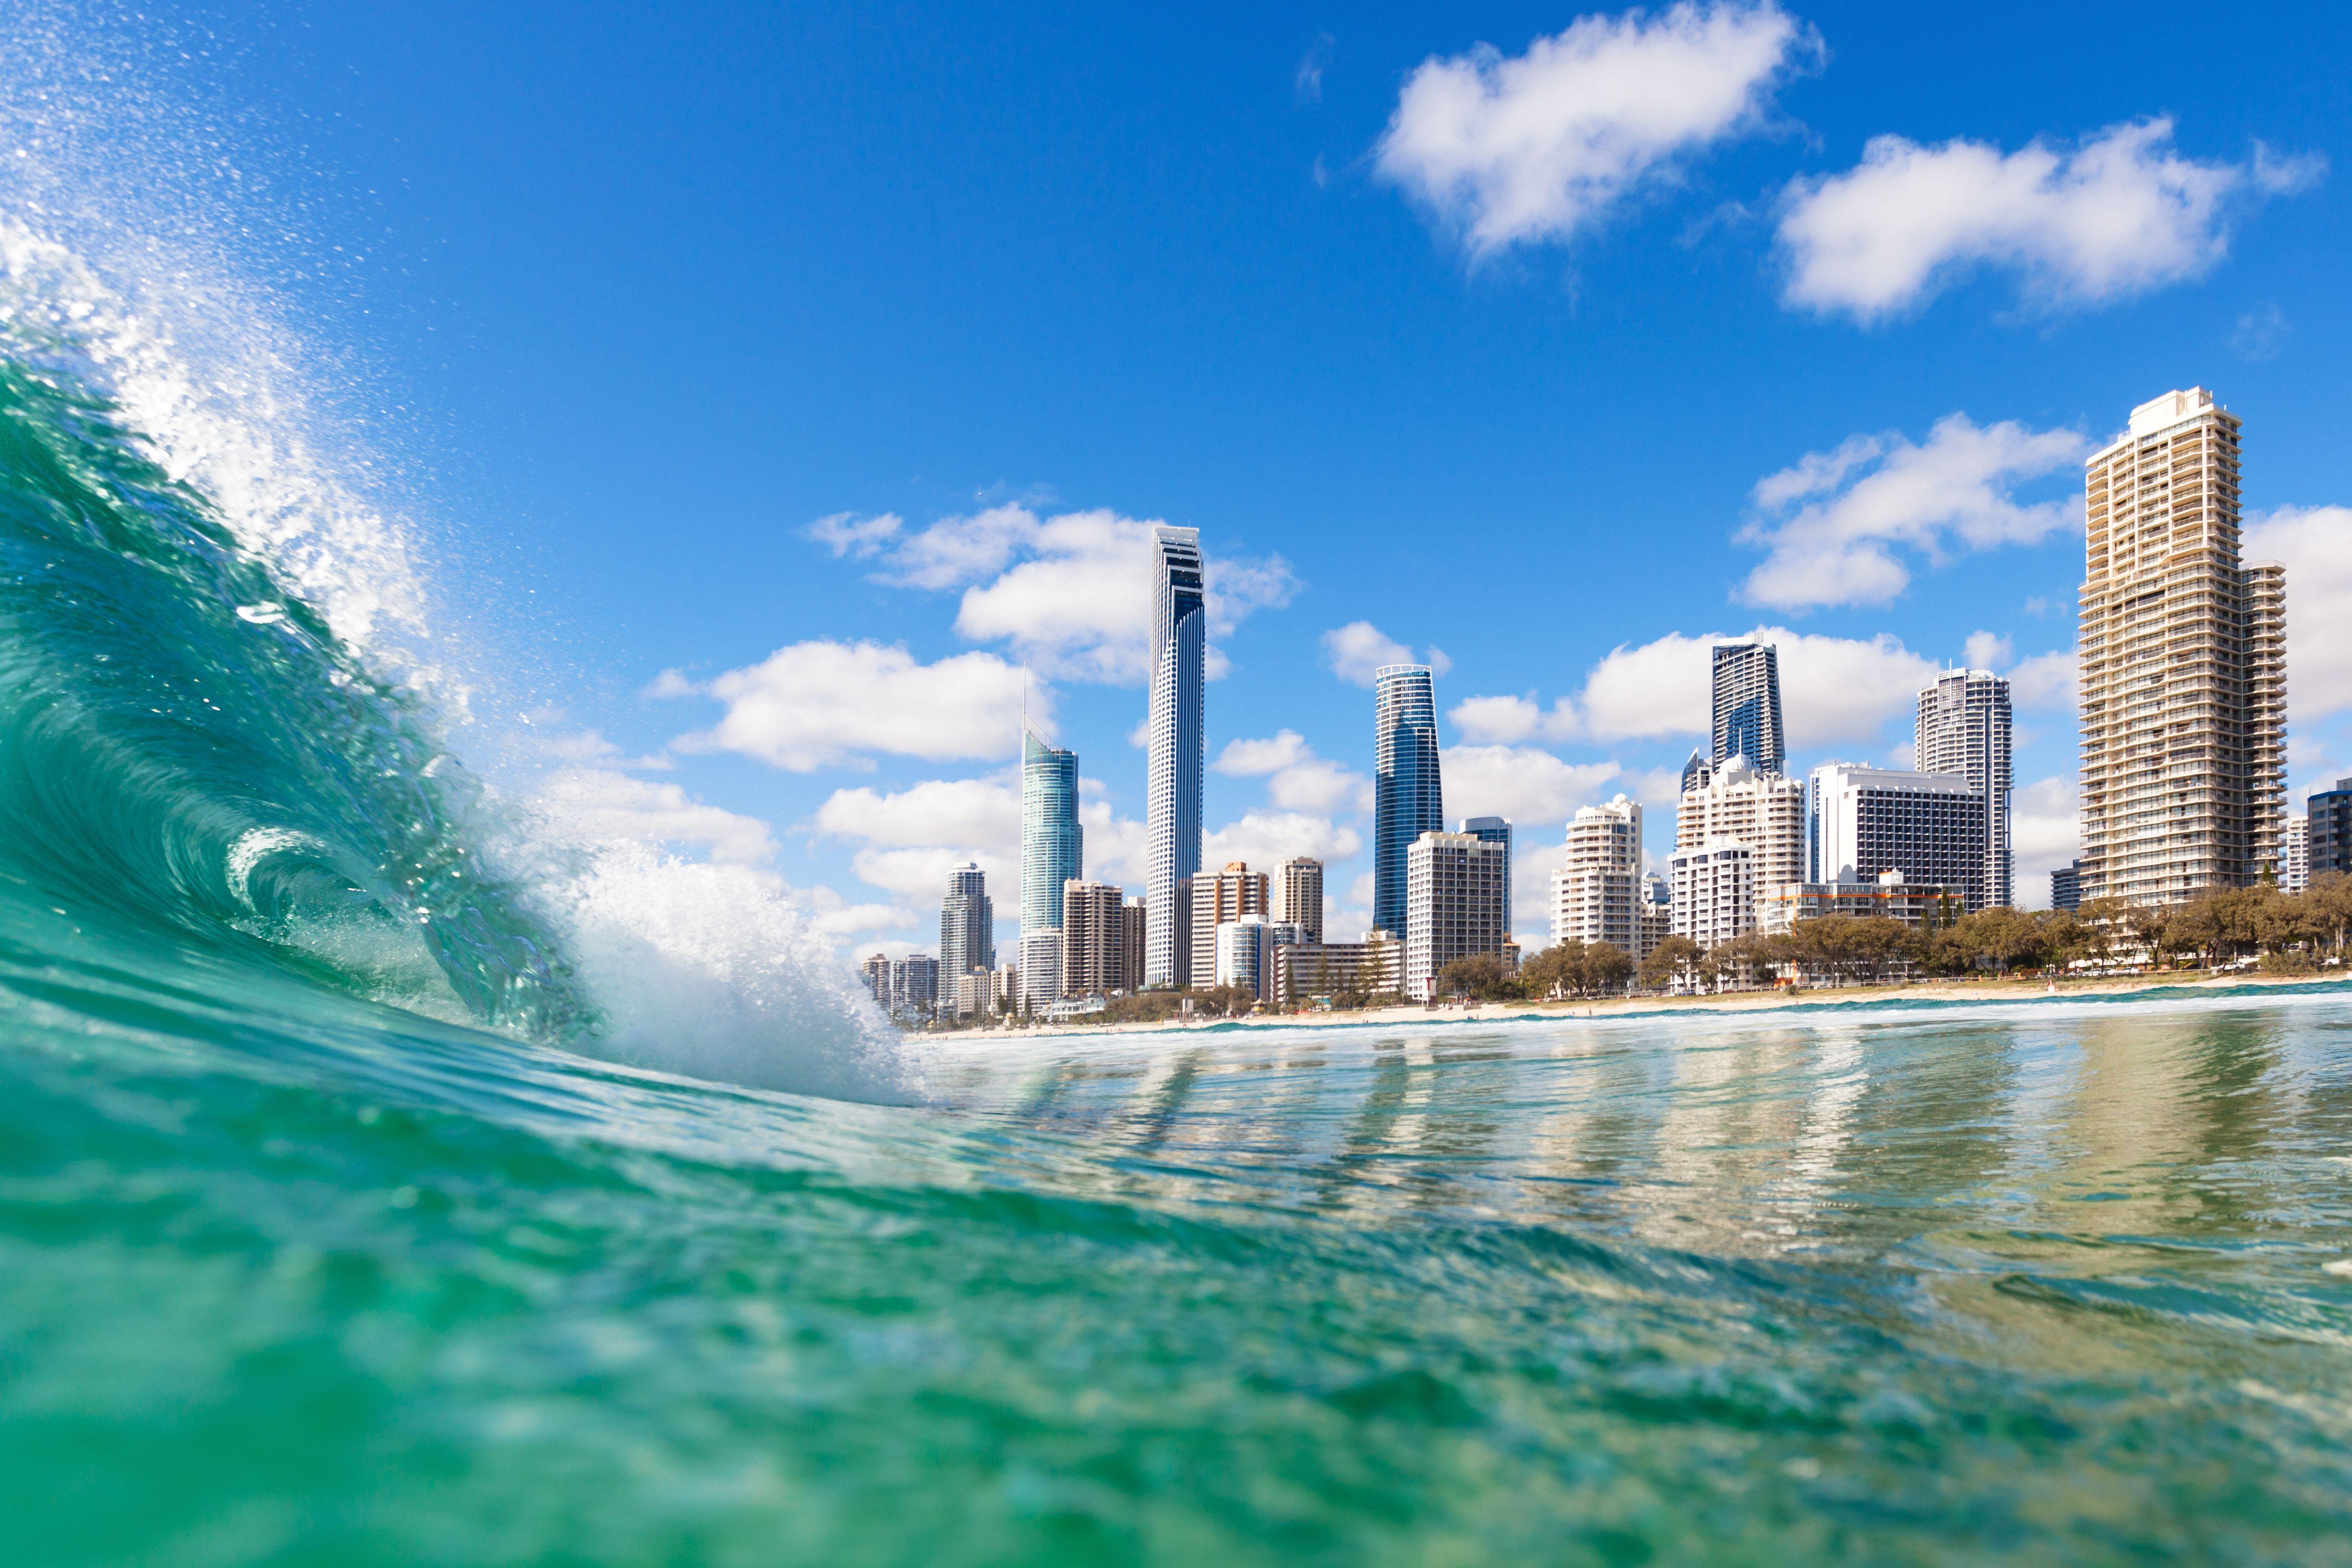 Gold Coast Buildings